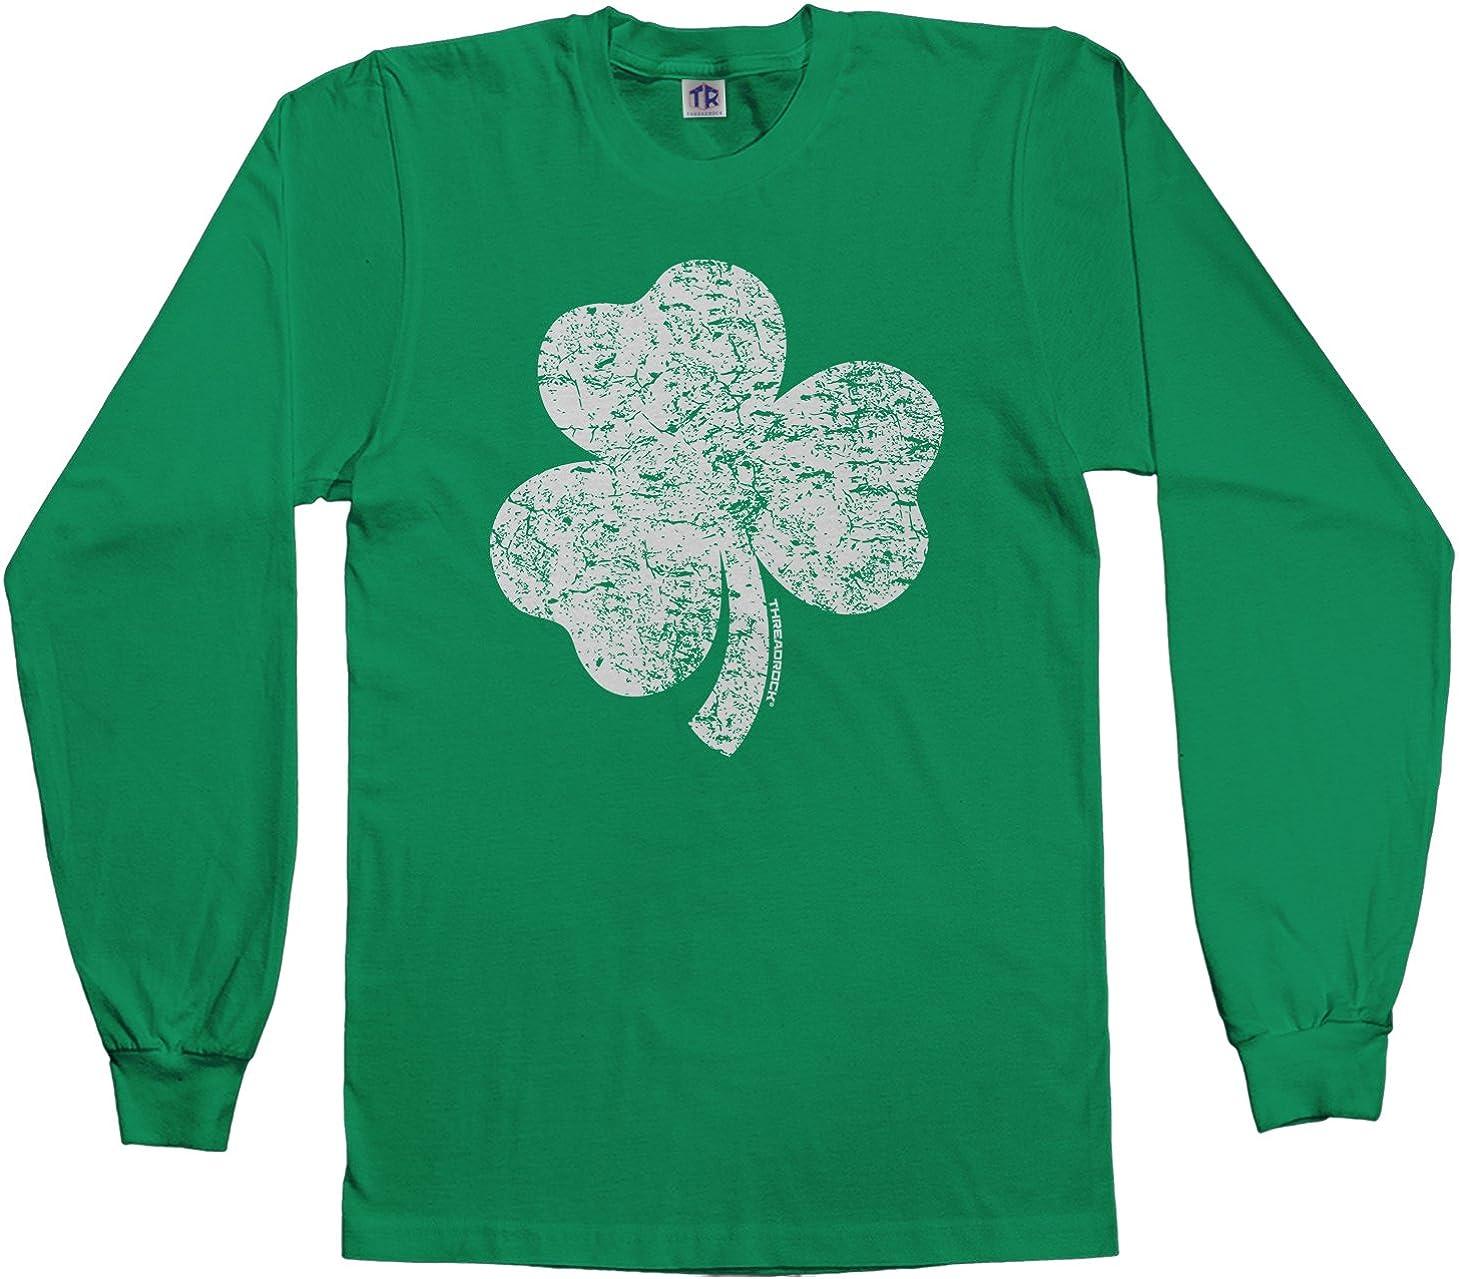 Threadrock Kids Shamrock of Shamrocks Youth Hoodie Sweatshirt Irish Pride